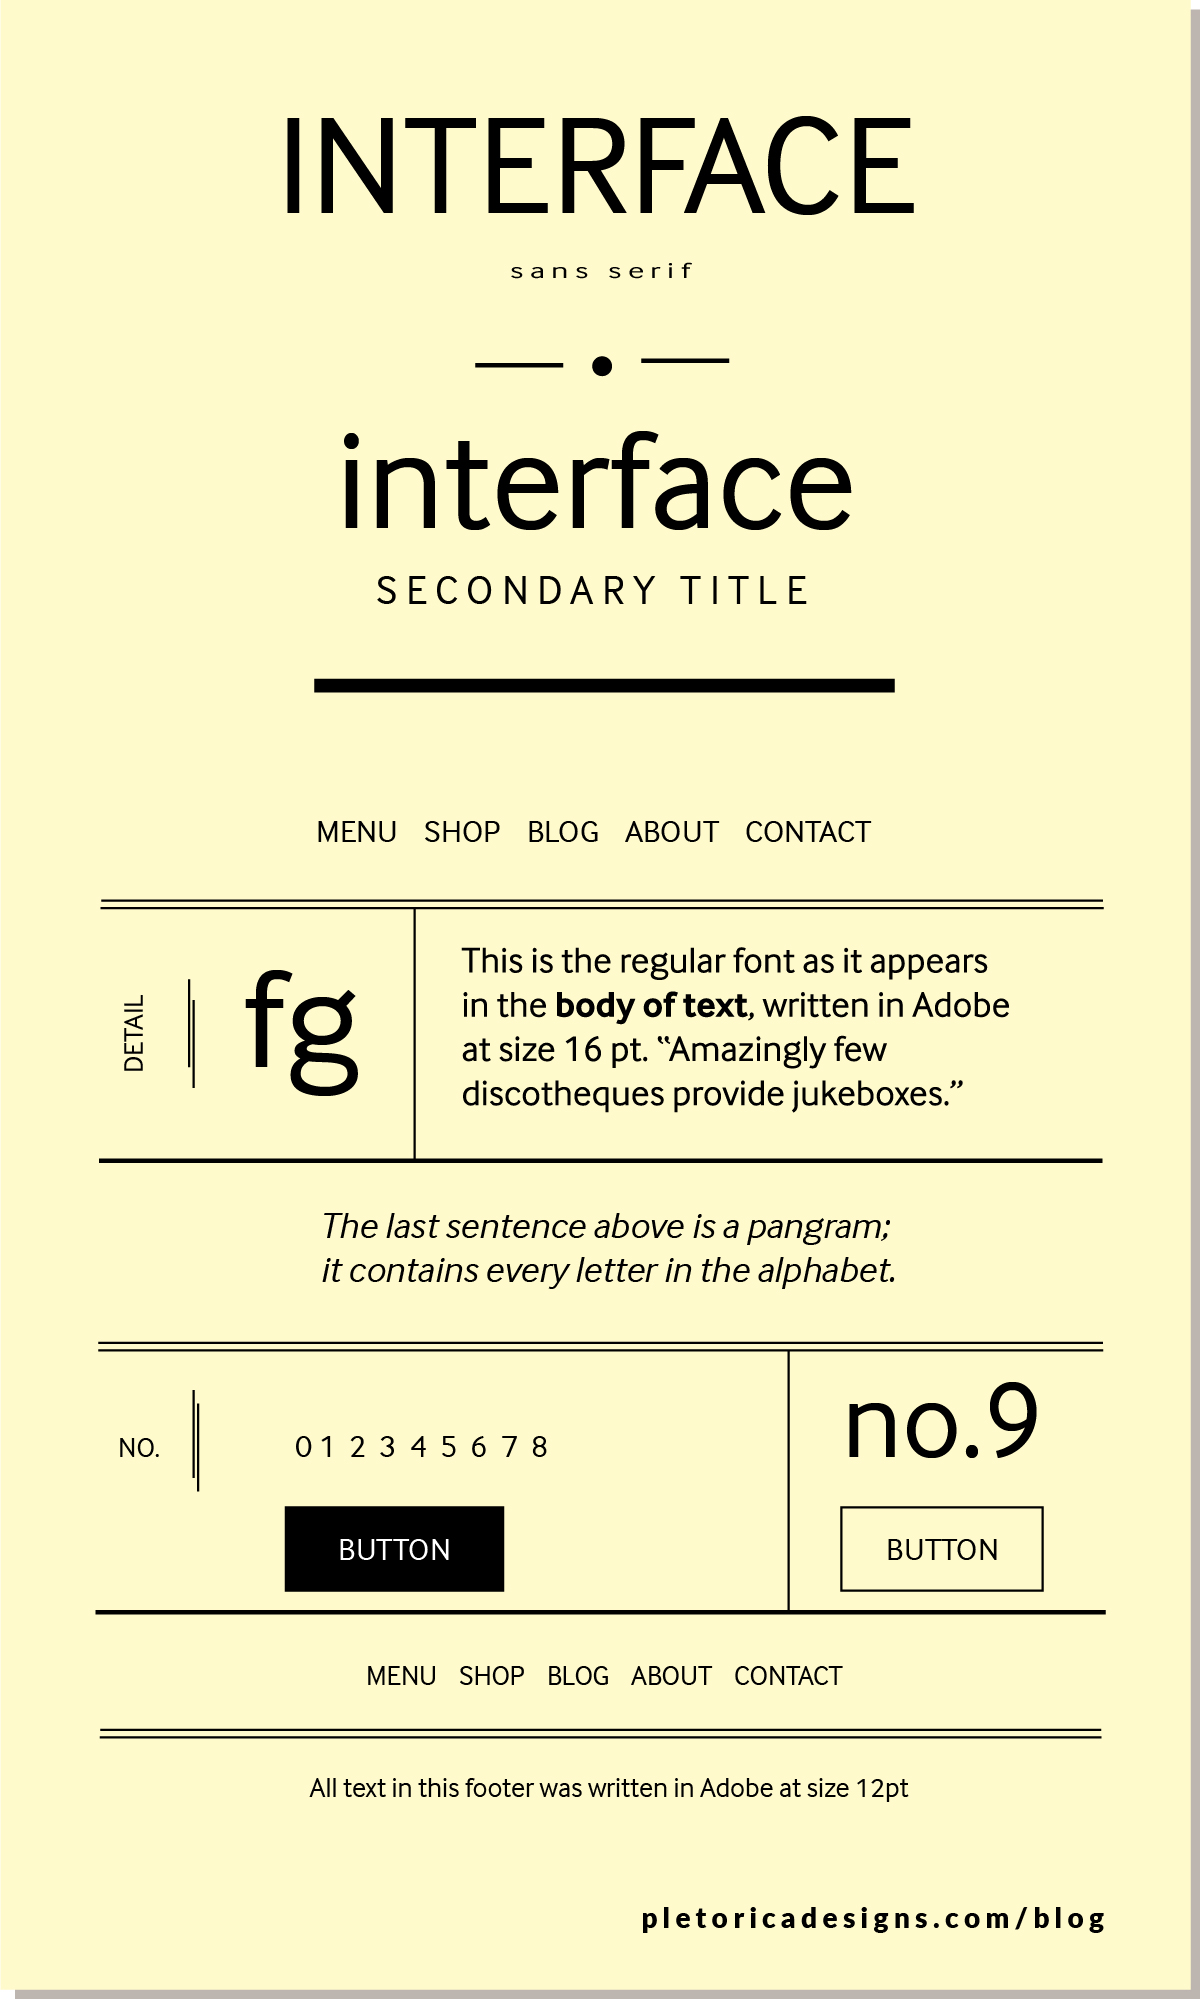 LET'S TYPE: Interface — PLETÓRICA DESIGNS